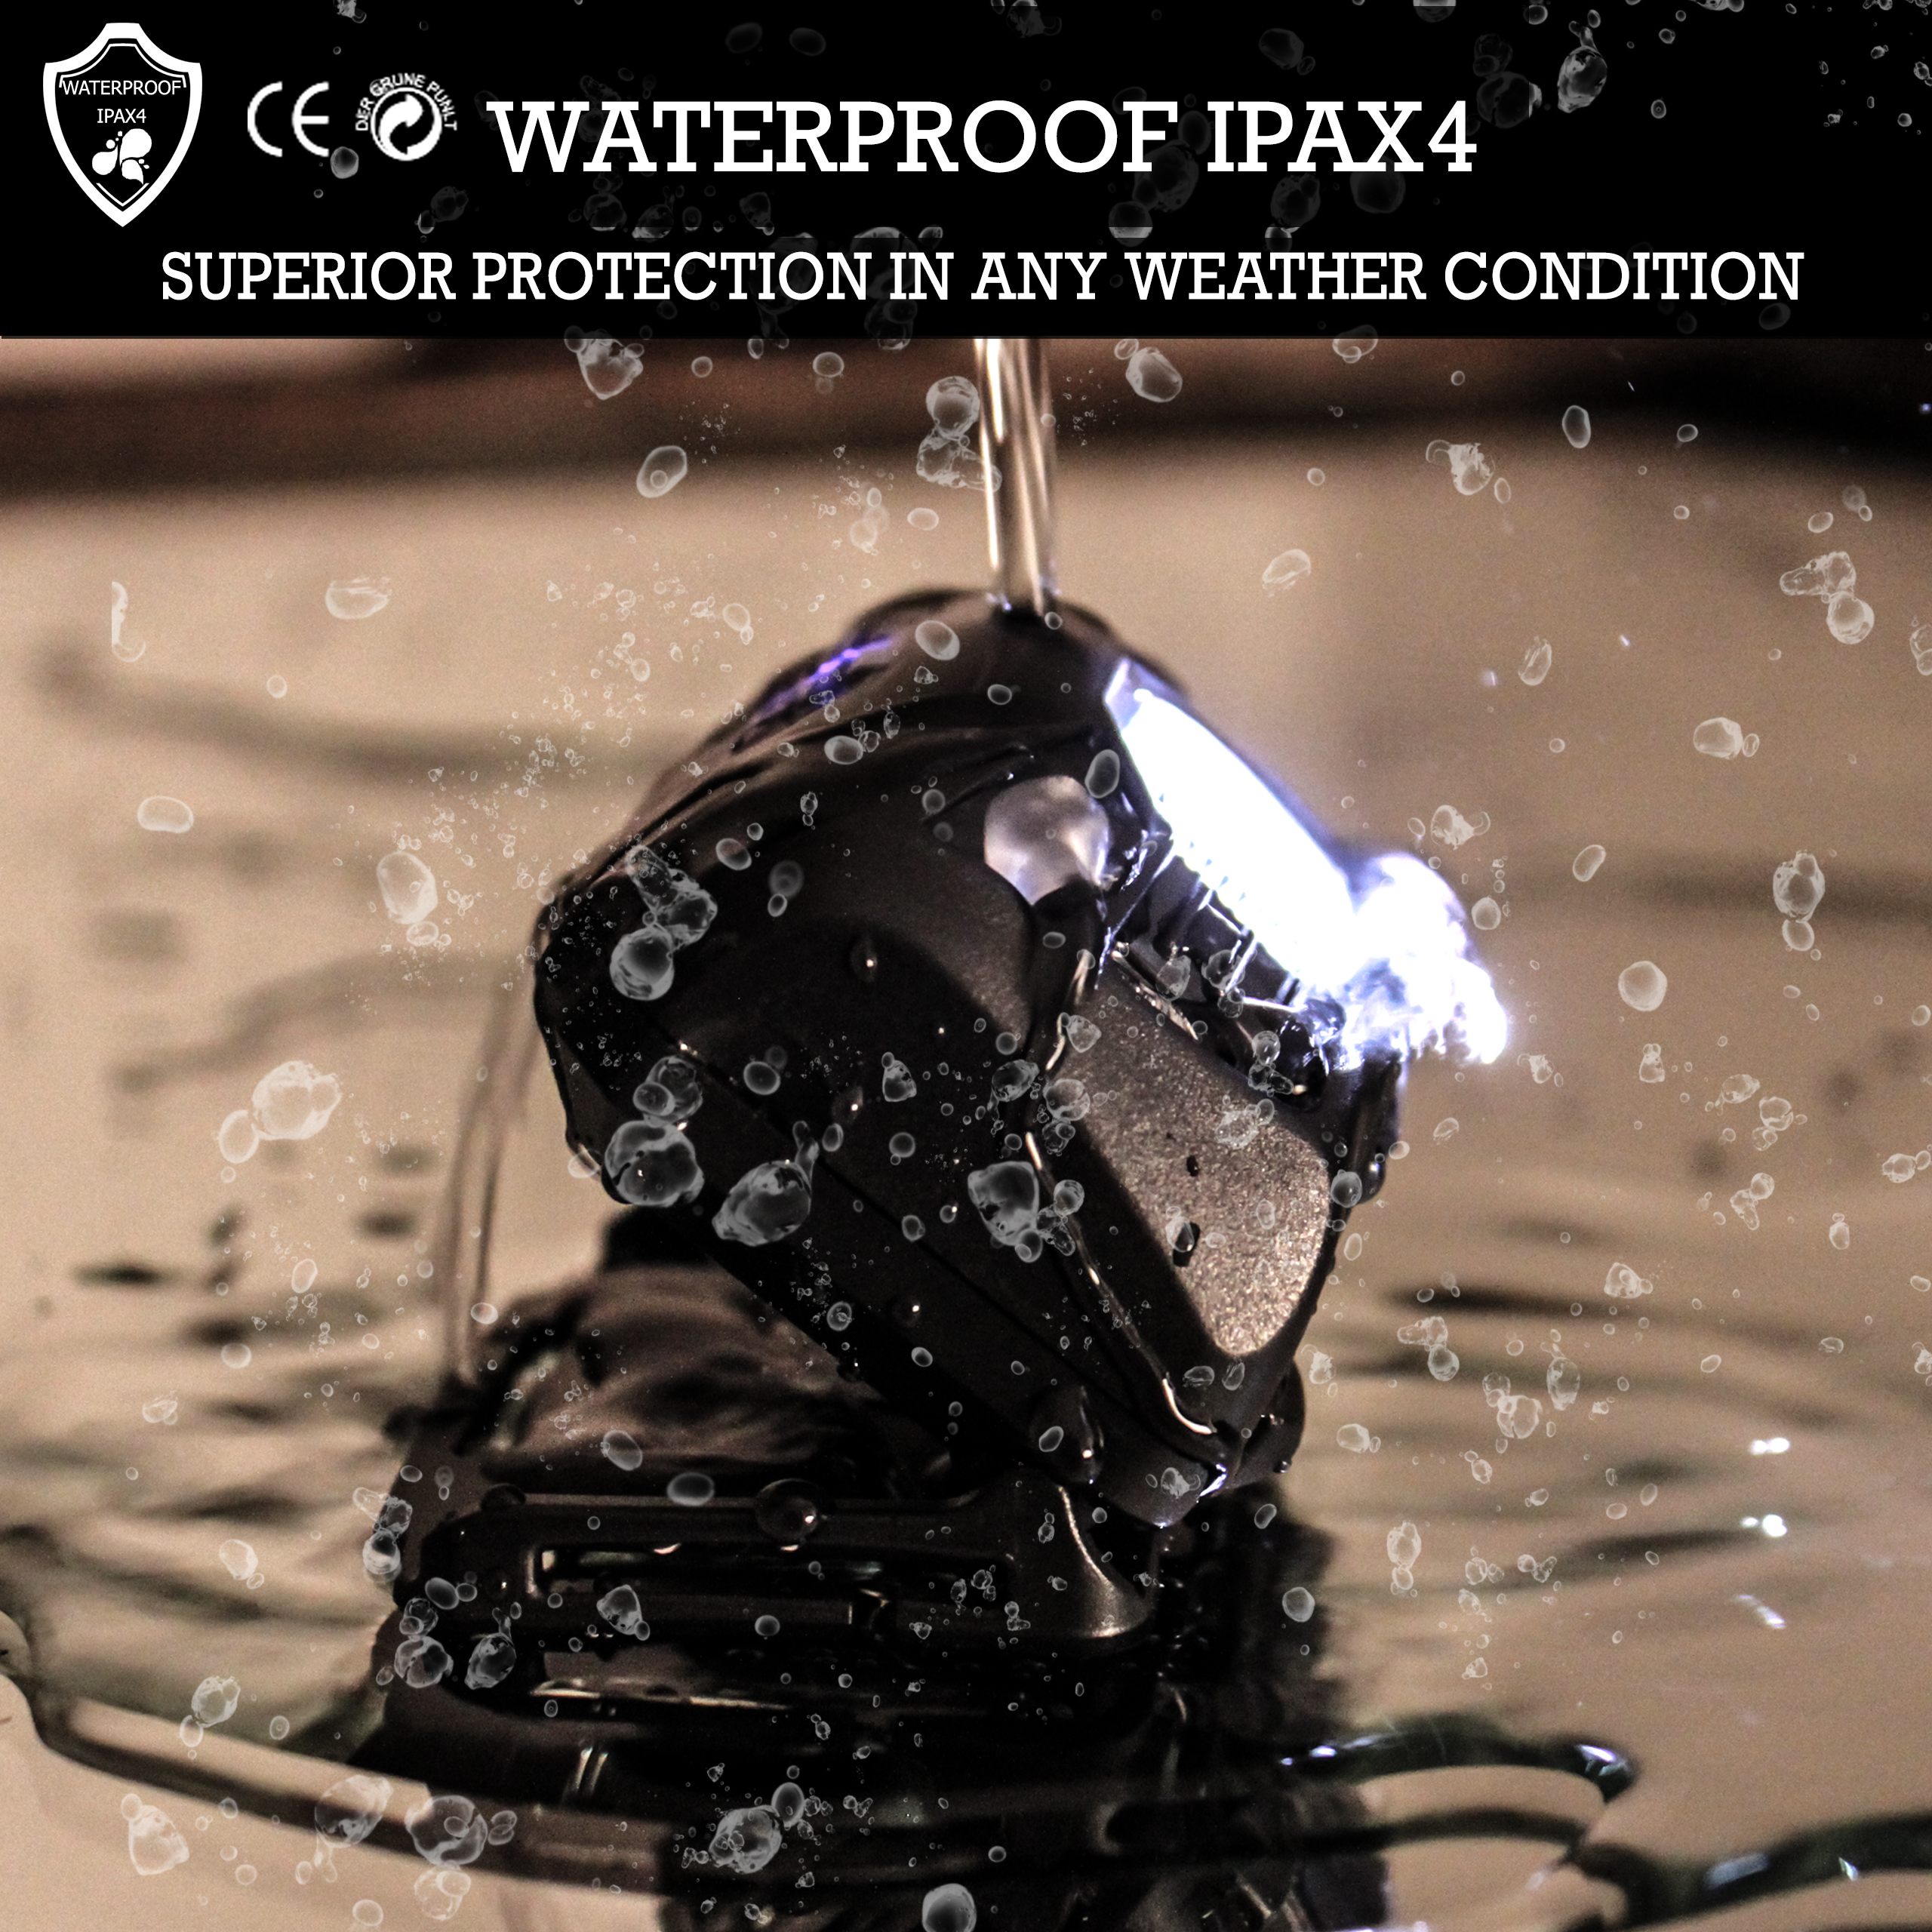 ipax4 waterproof